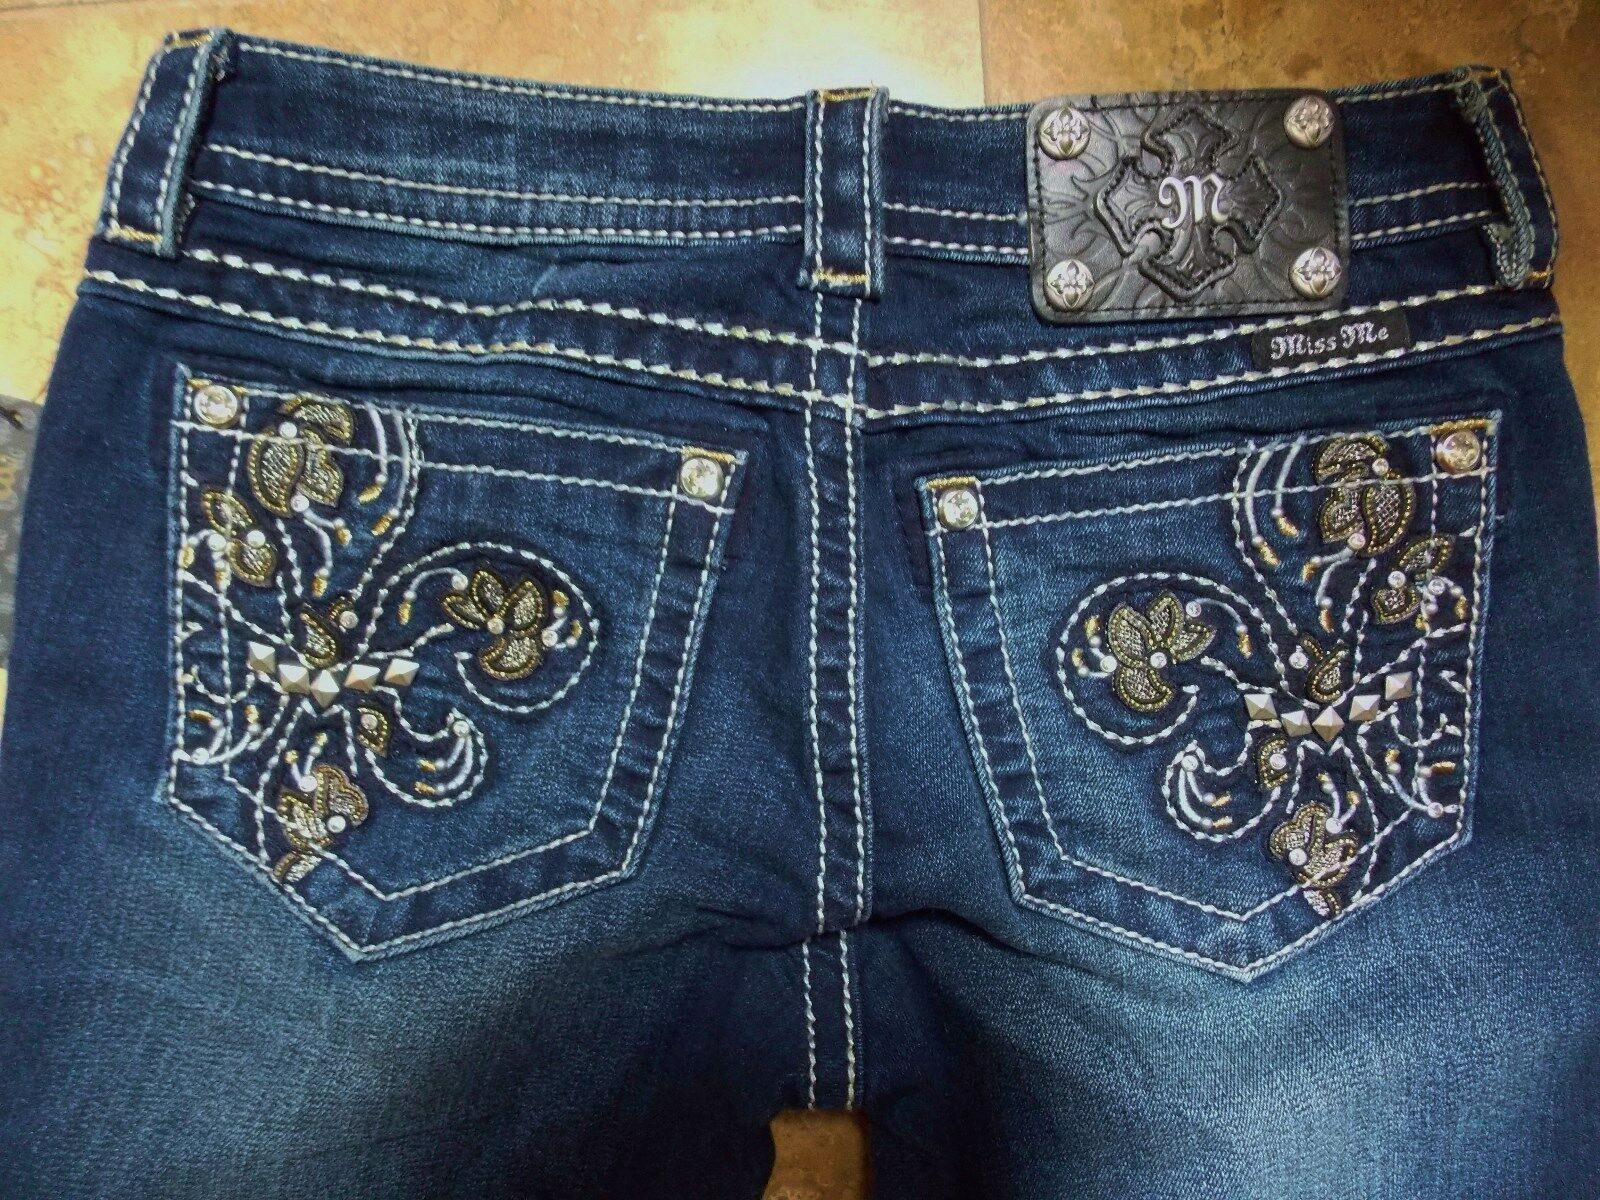 Miss Me JP5576S2 Fluer De Lis Gld Blk Dark bluee Skinny Jeans 24,26,27 SALE